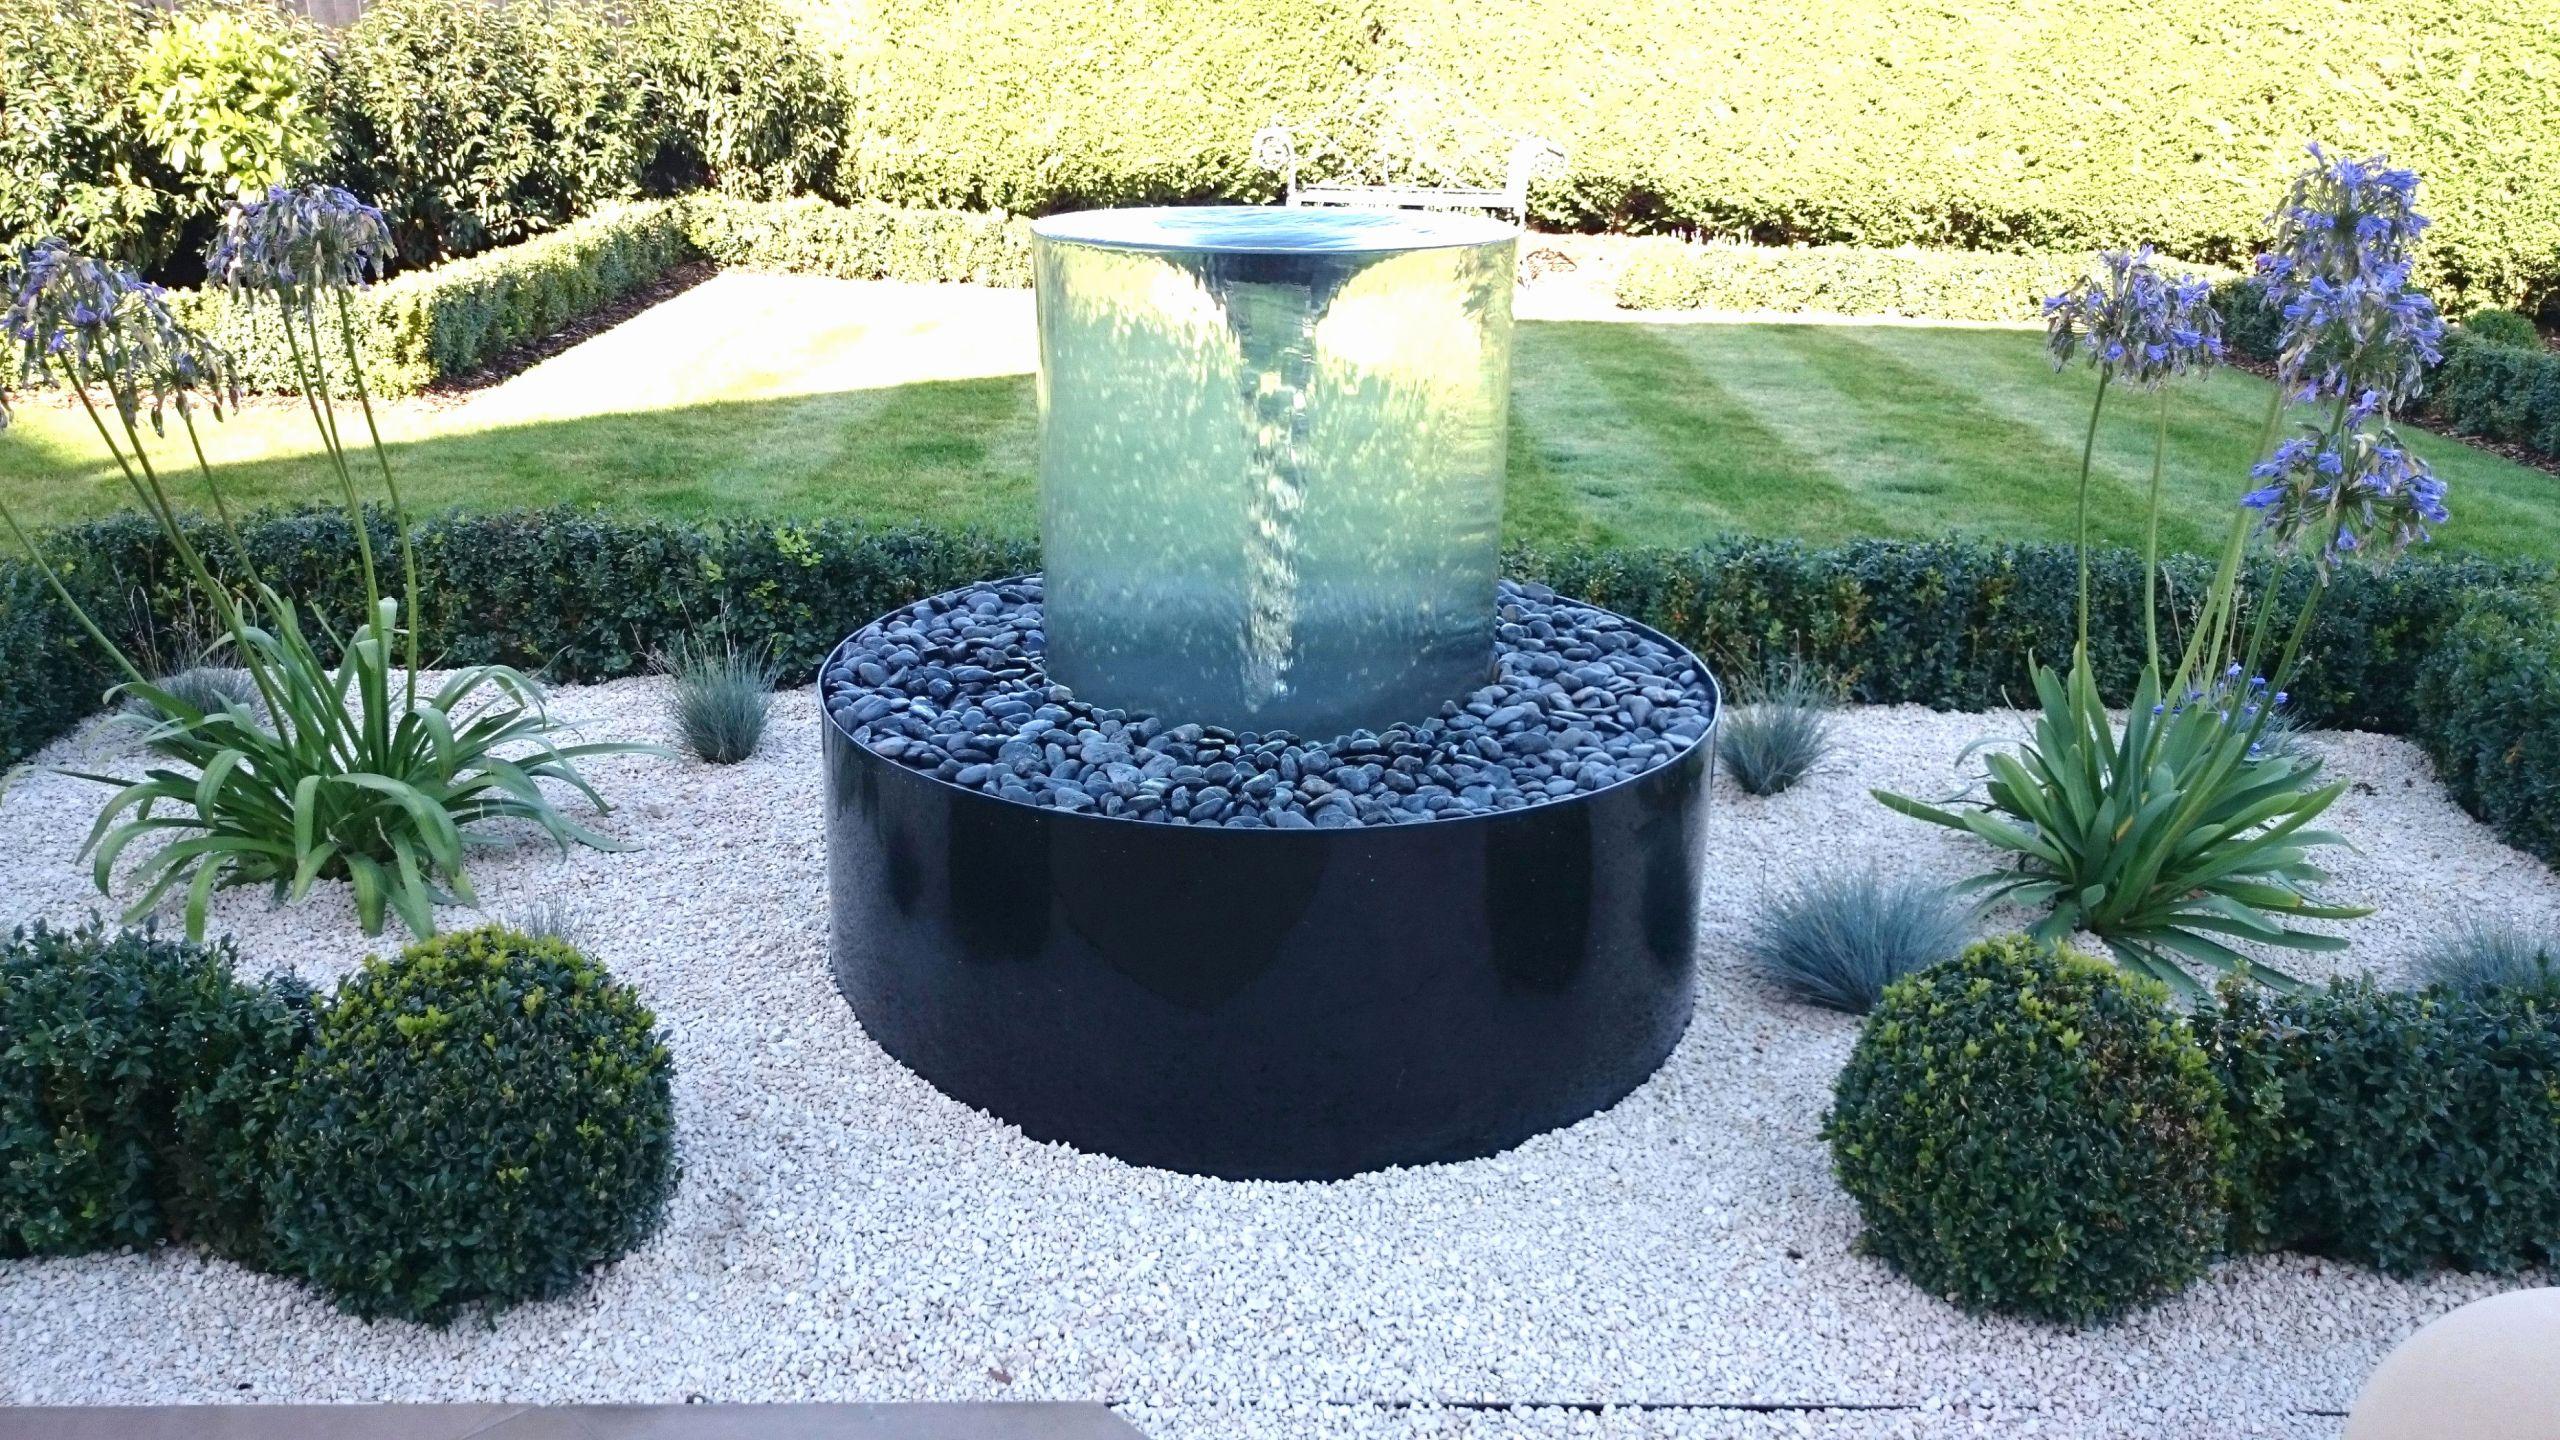 modern garden fountain awesome gartengestaltung bilder modern schon garten couch lounge moderne of modern garden fountain